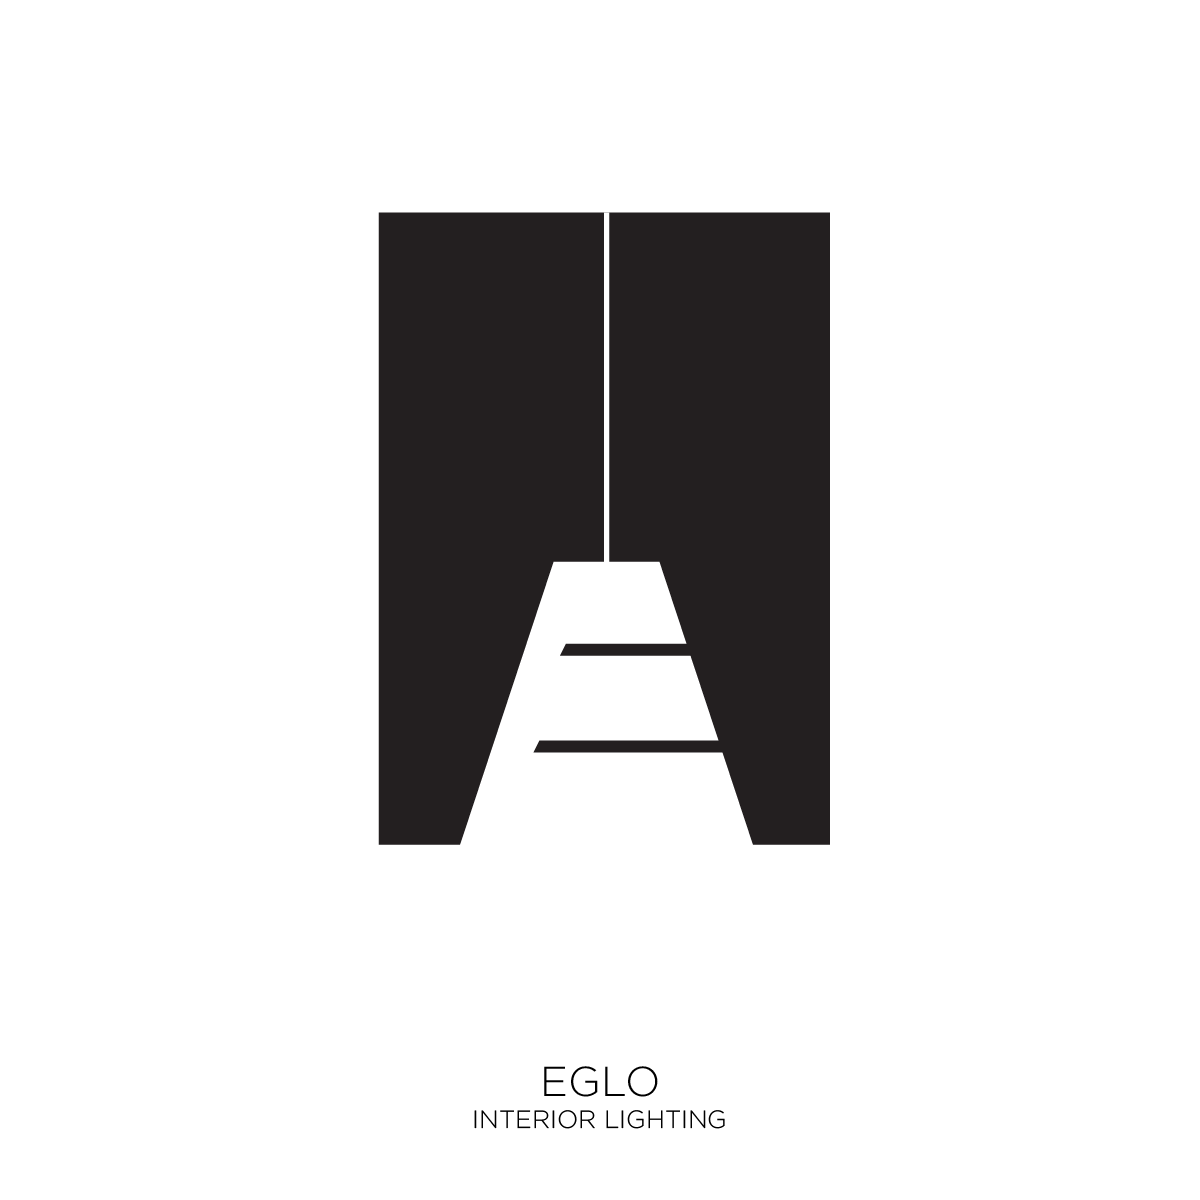 Eglo logo-01.png